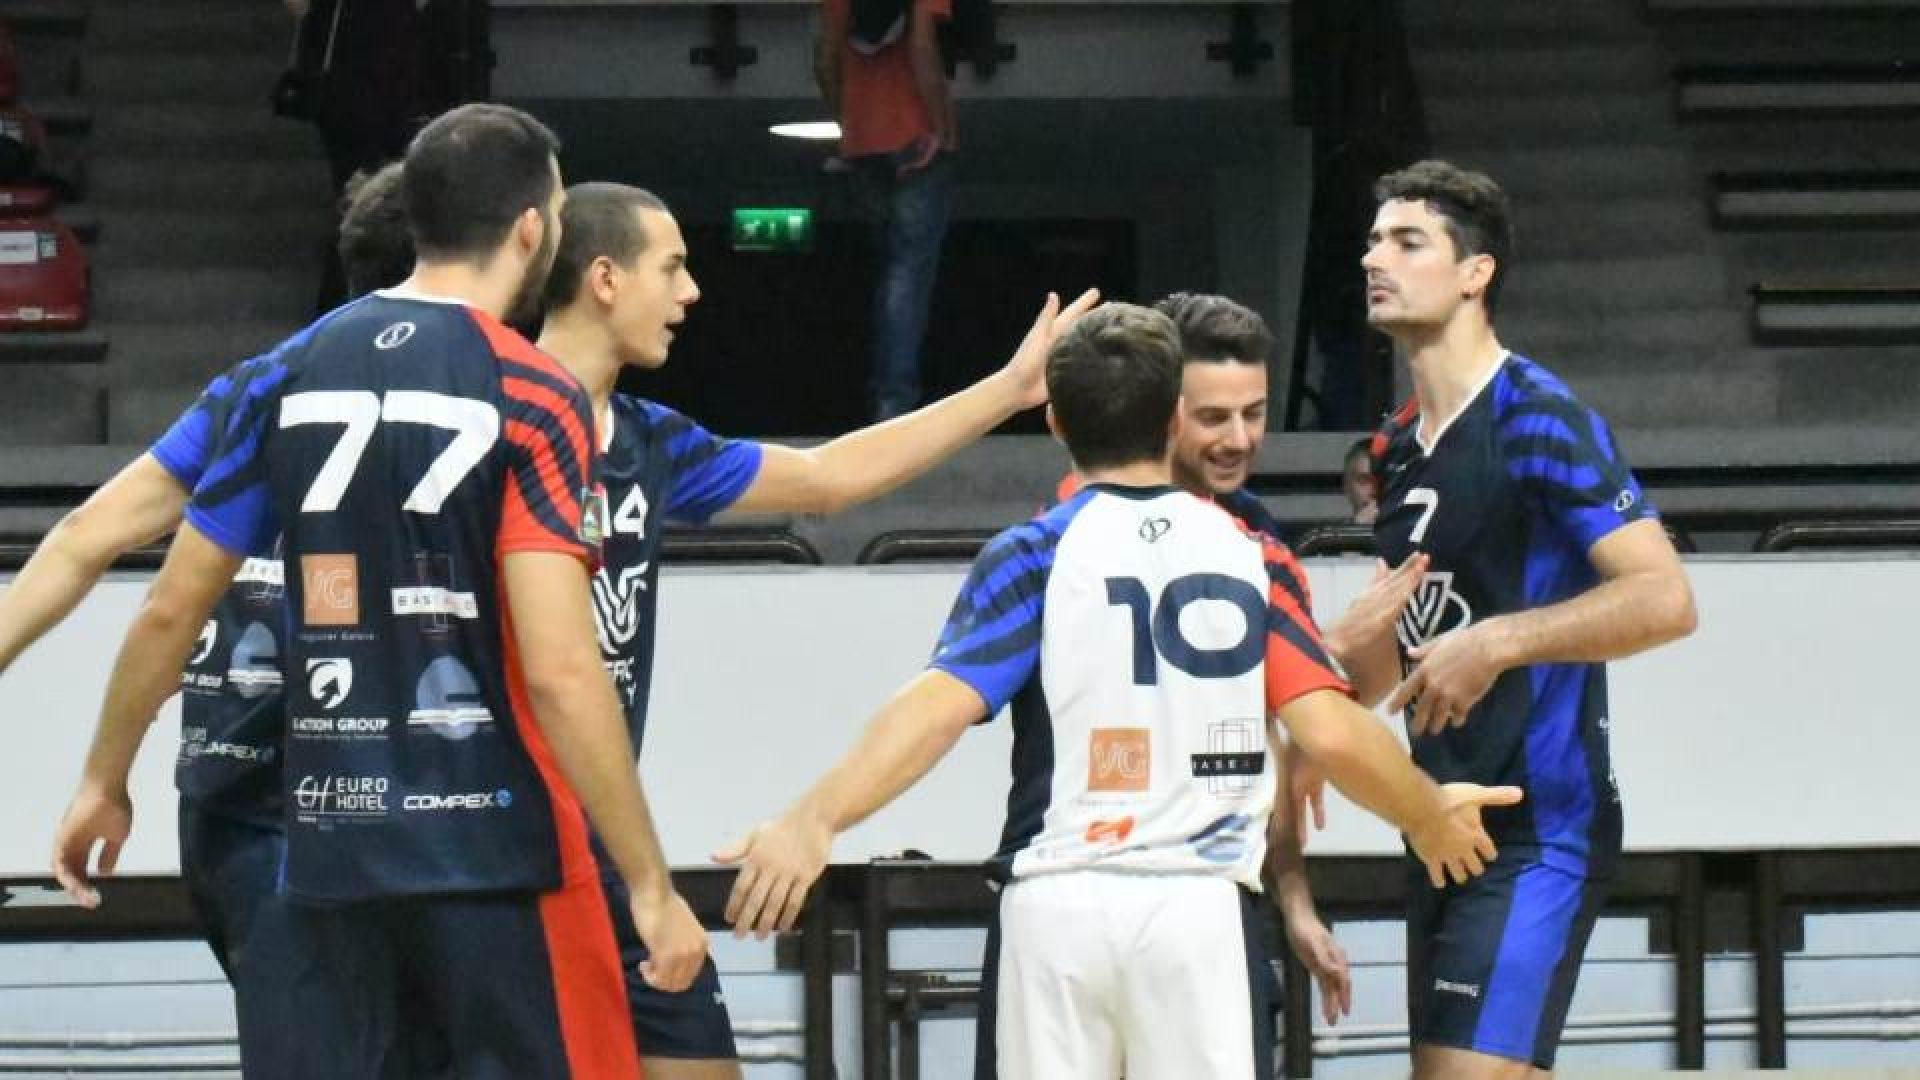 Gioia Vero Volley Monza